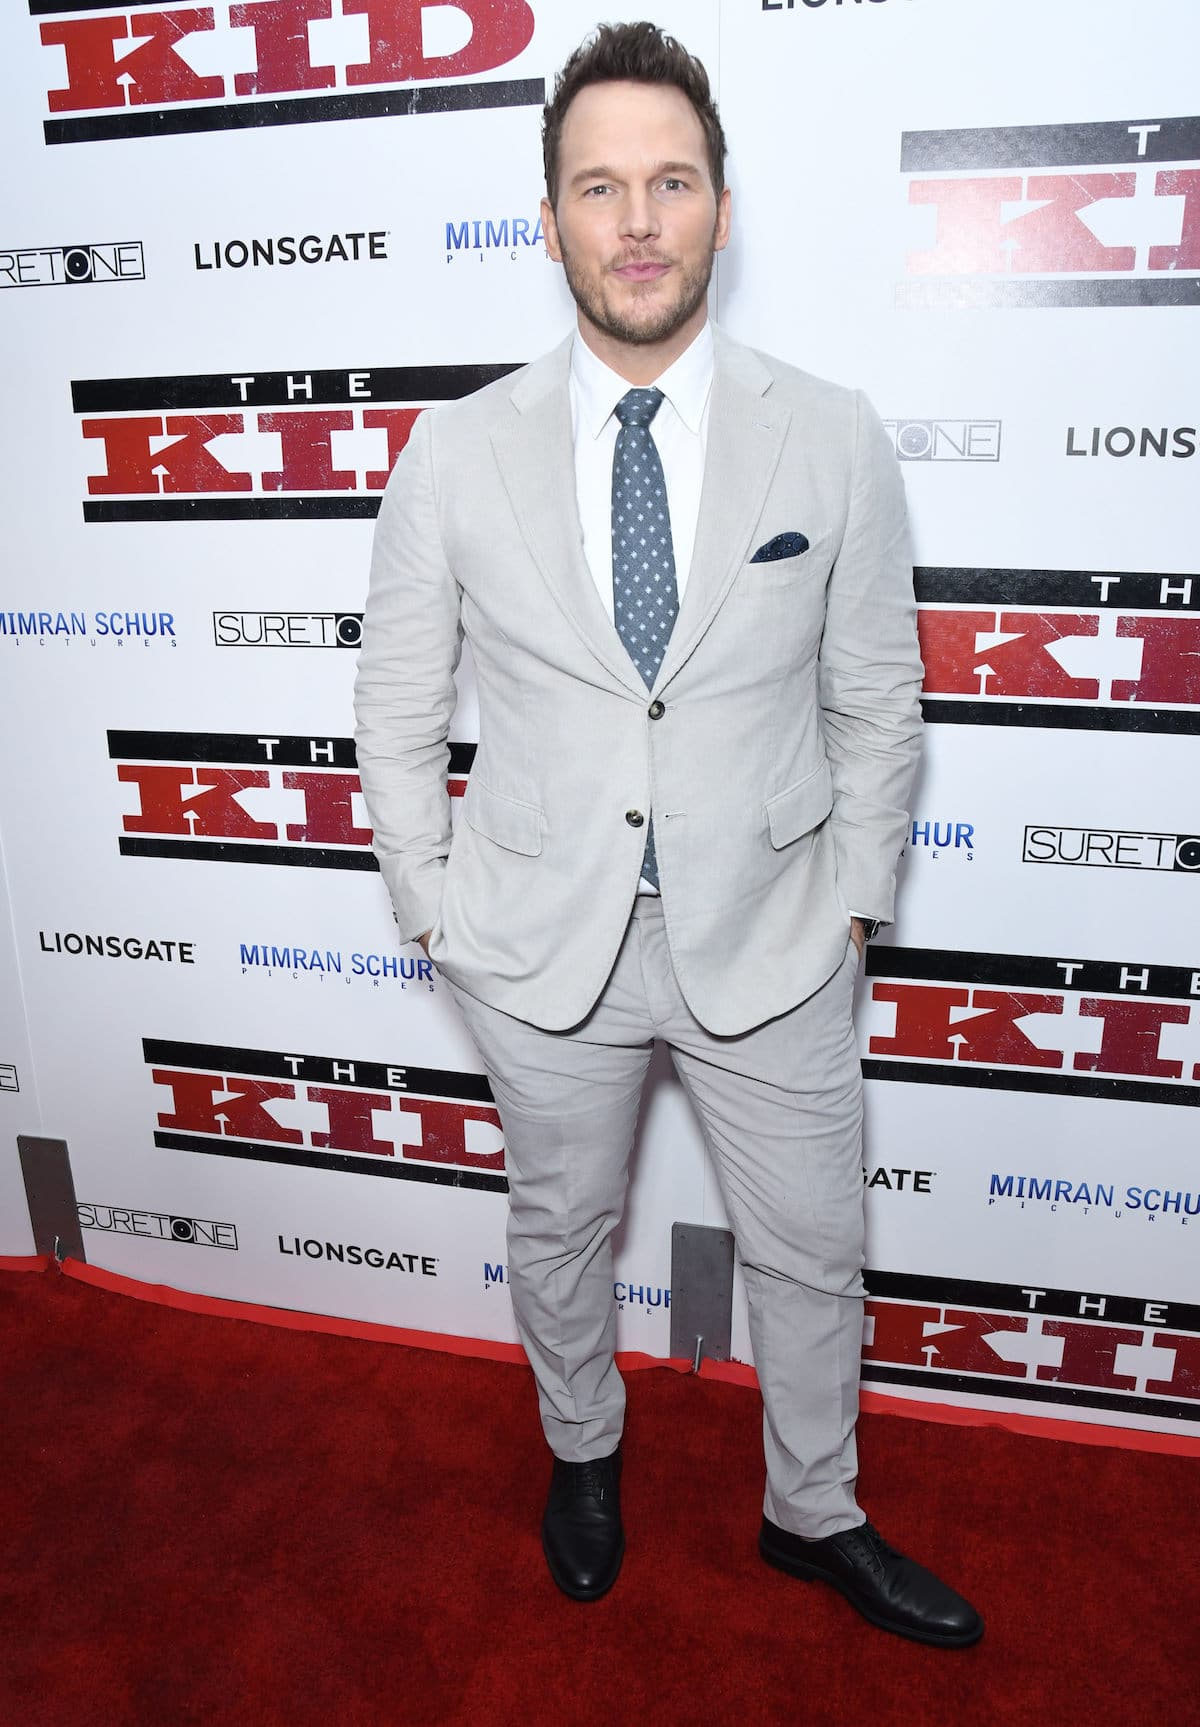 Full-length picture of Chris Pratt in his suit